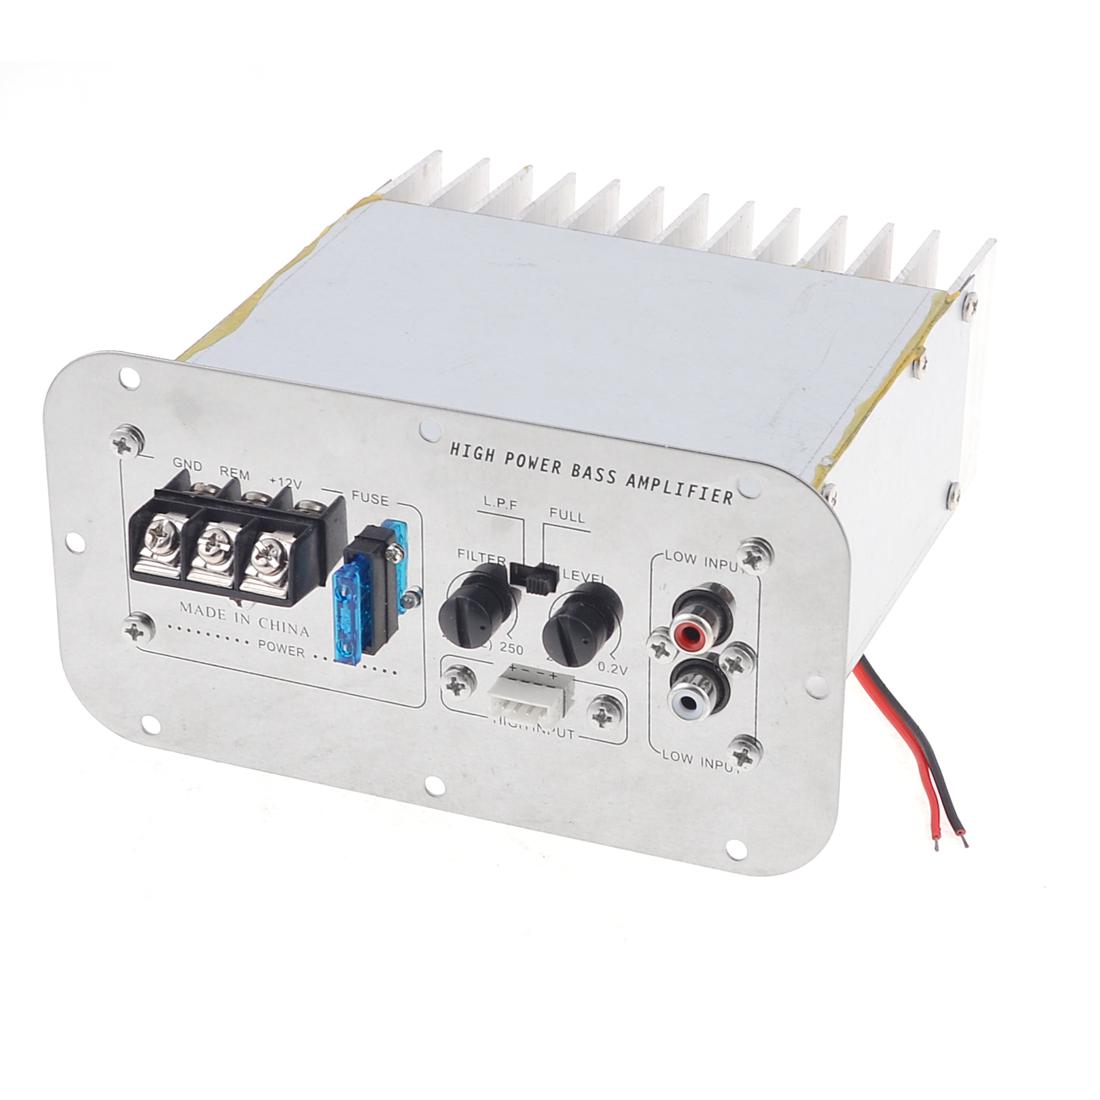 Unique Bargains Car Aluminum Casing LFE Hi-Fi Audio Stereo Power Amplifier Board Silver Tone